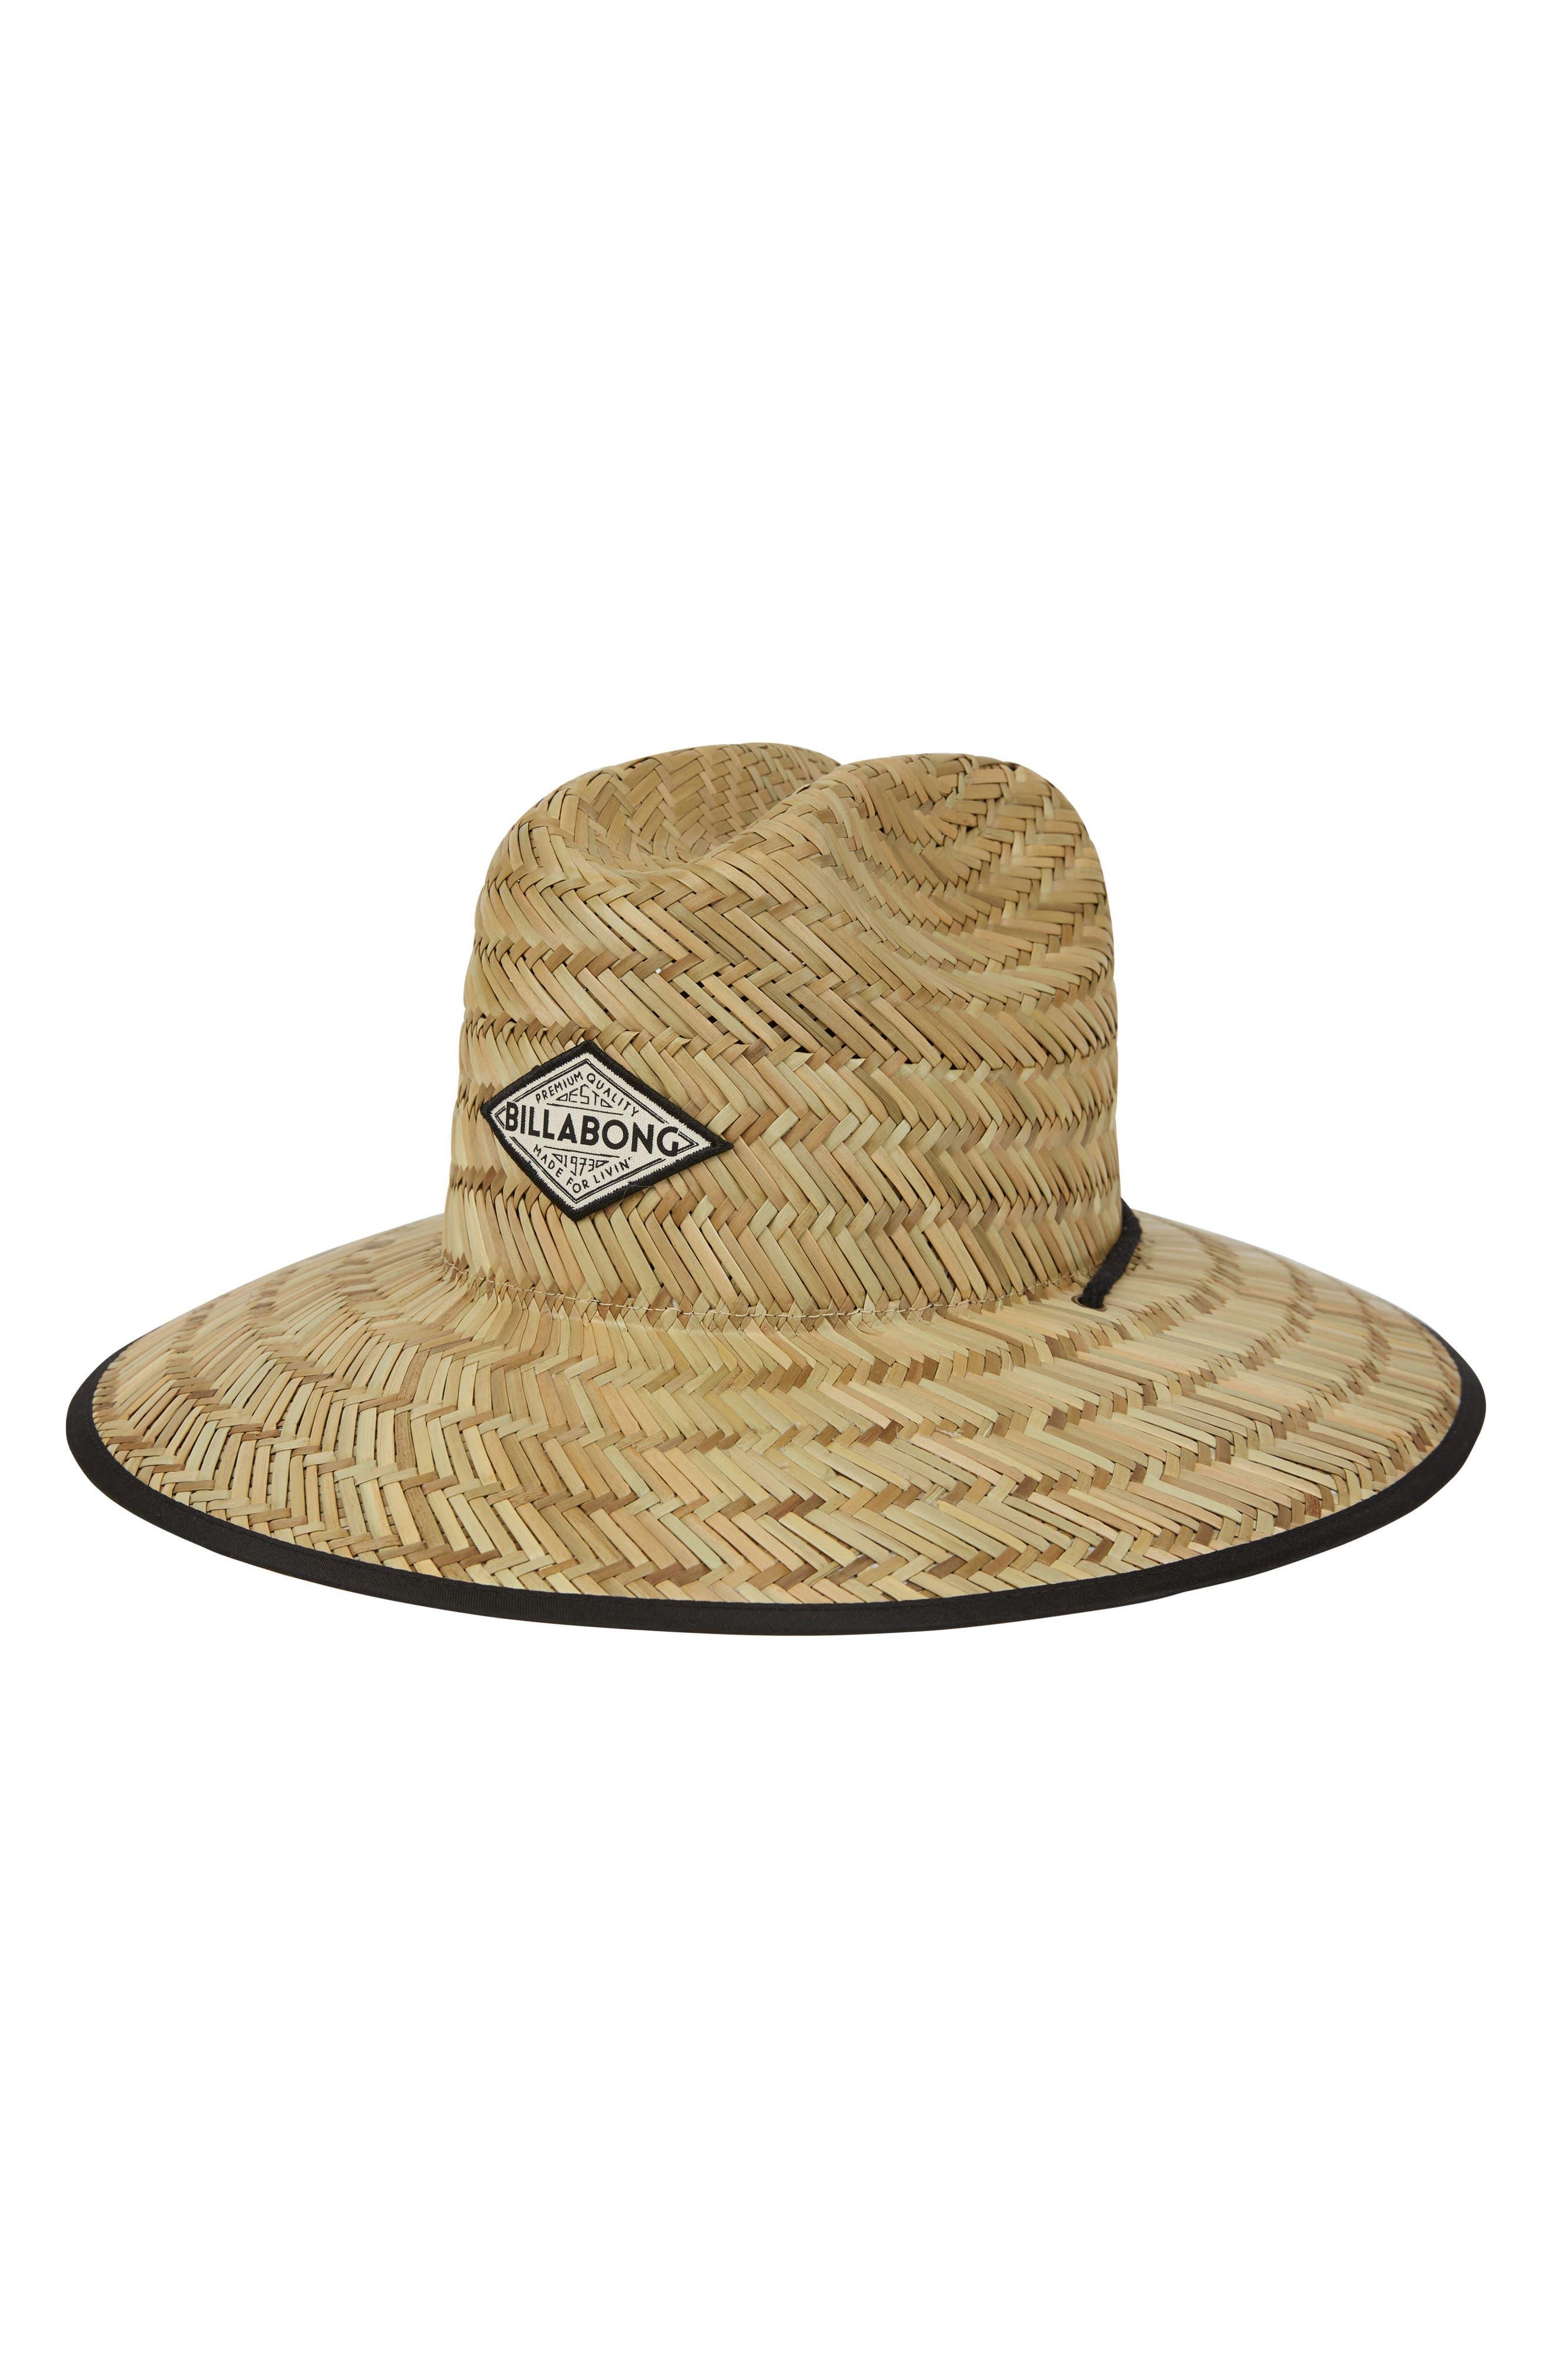 Billabong Tipton Straw Hat